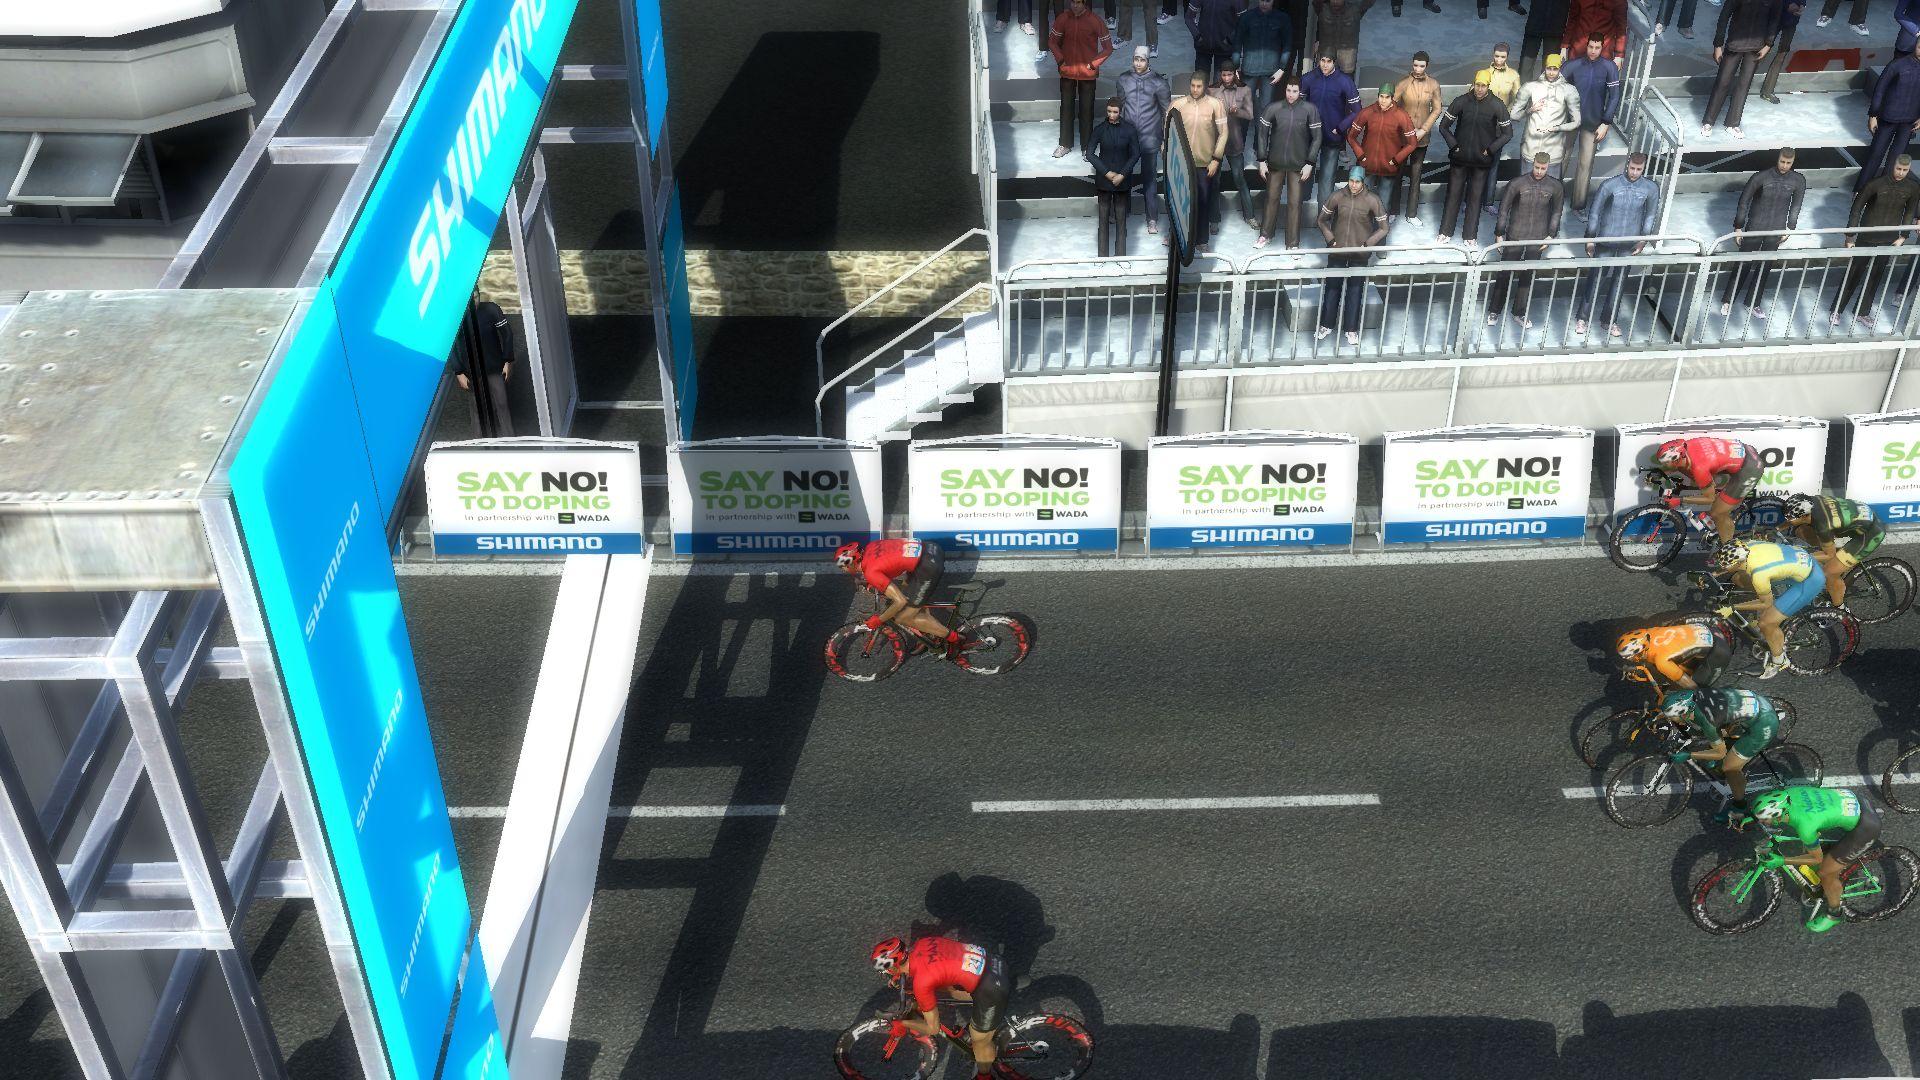 pcmdaily.com/images/mg/2017/Races/HC/Dutch%20Food/DFV%2020.jpg